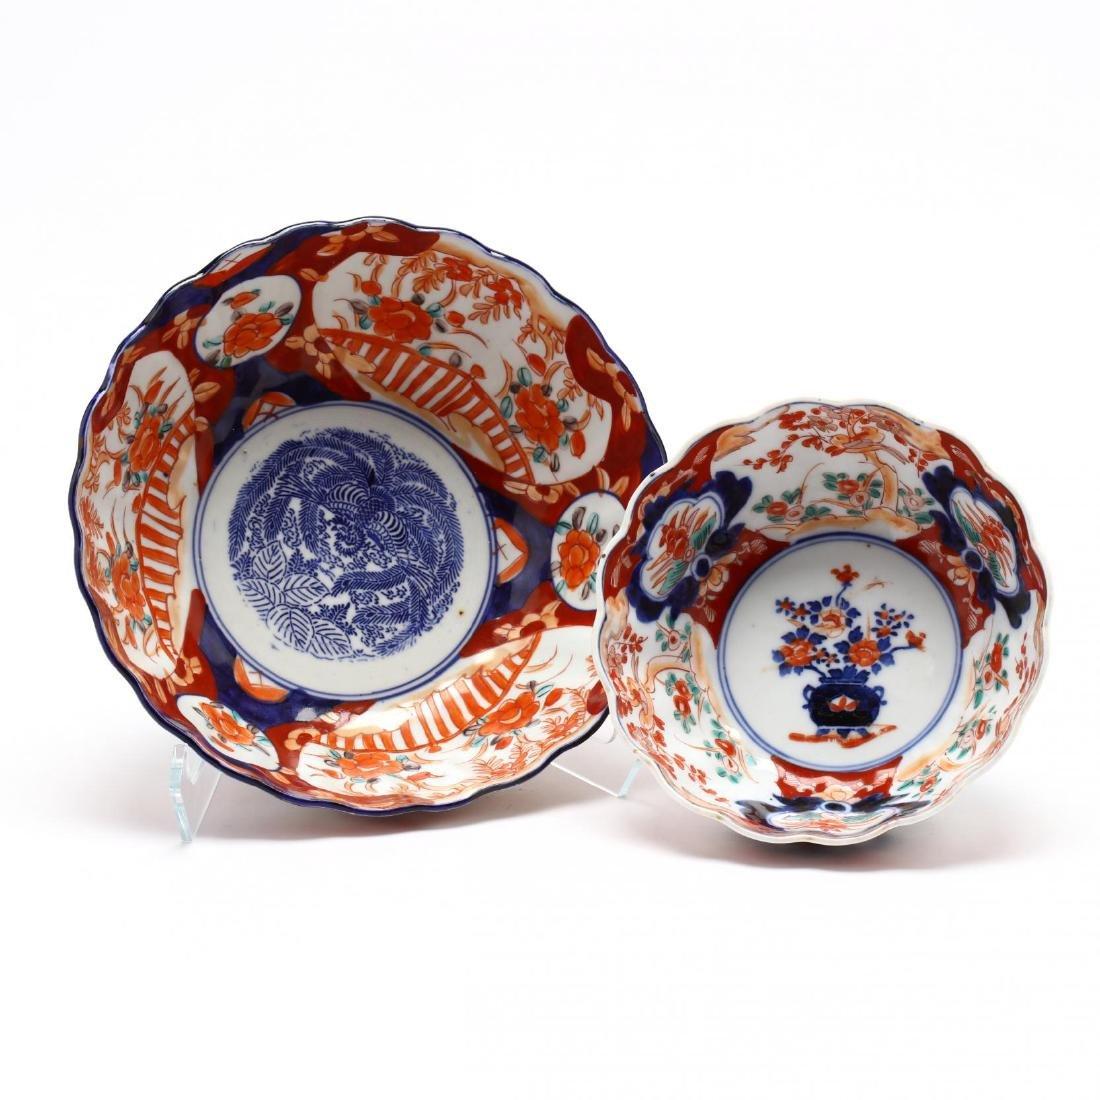 A Group of Imari Porcelain - 6